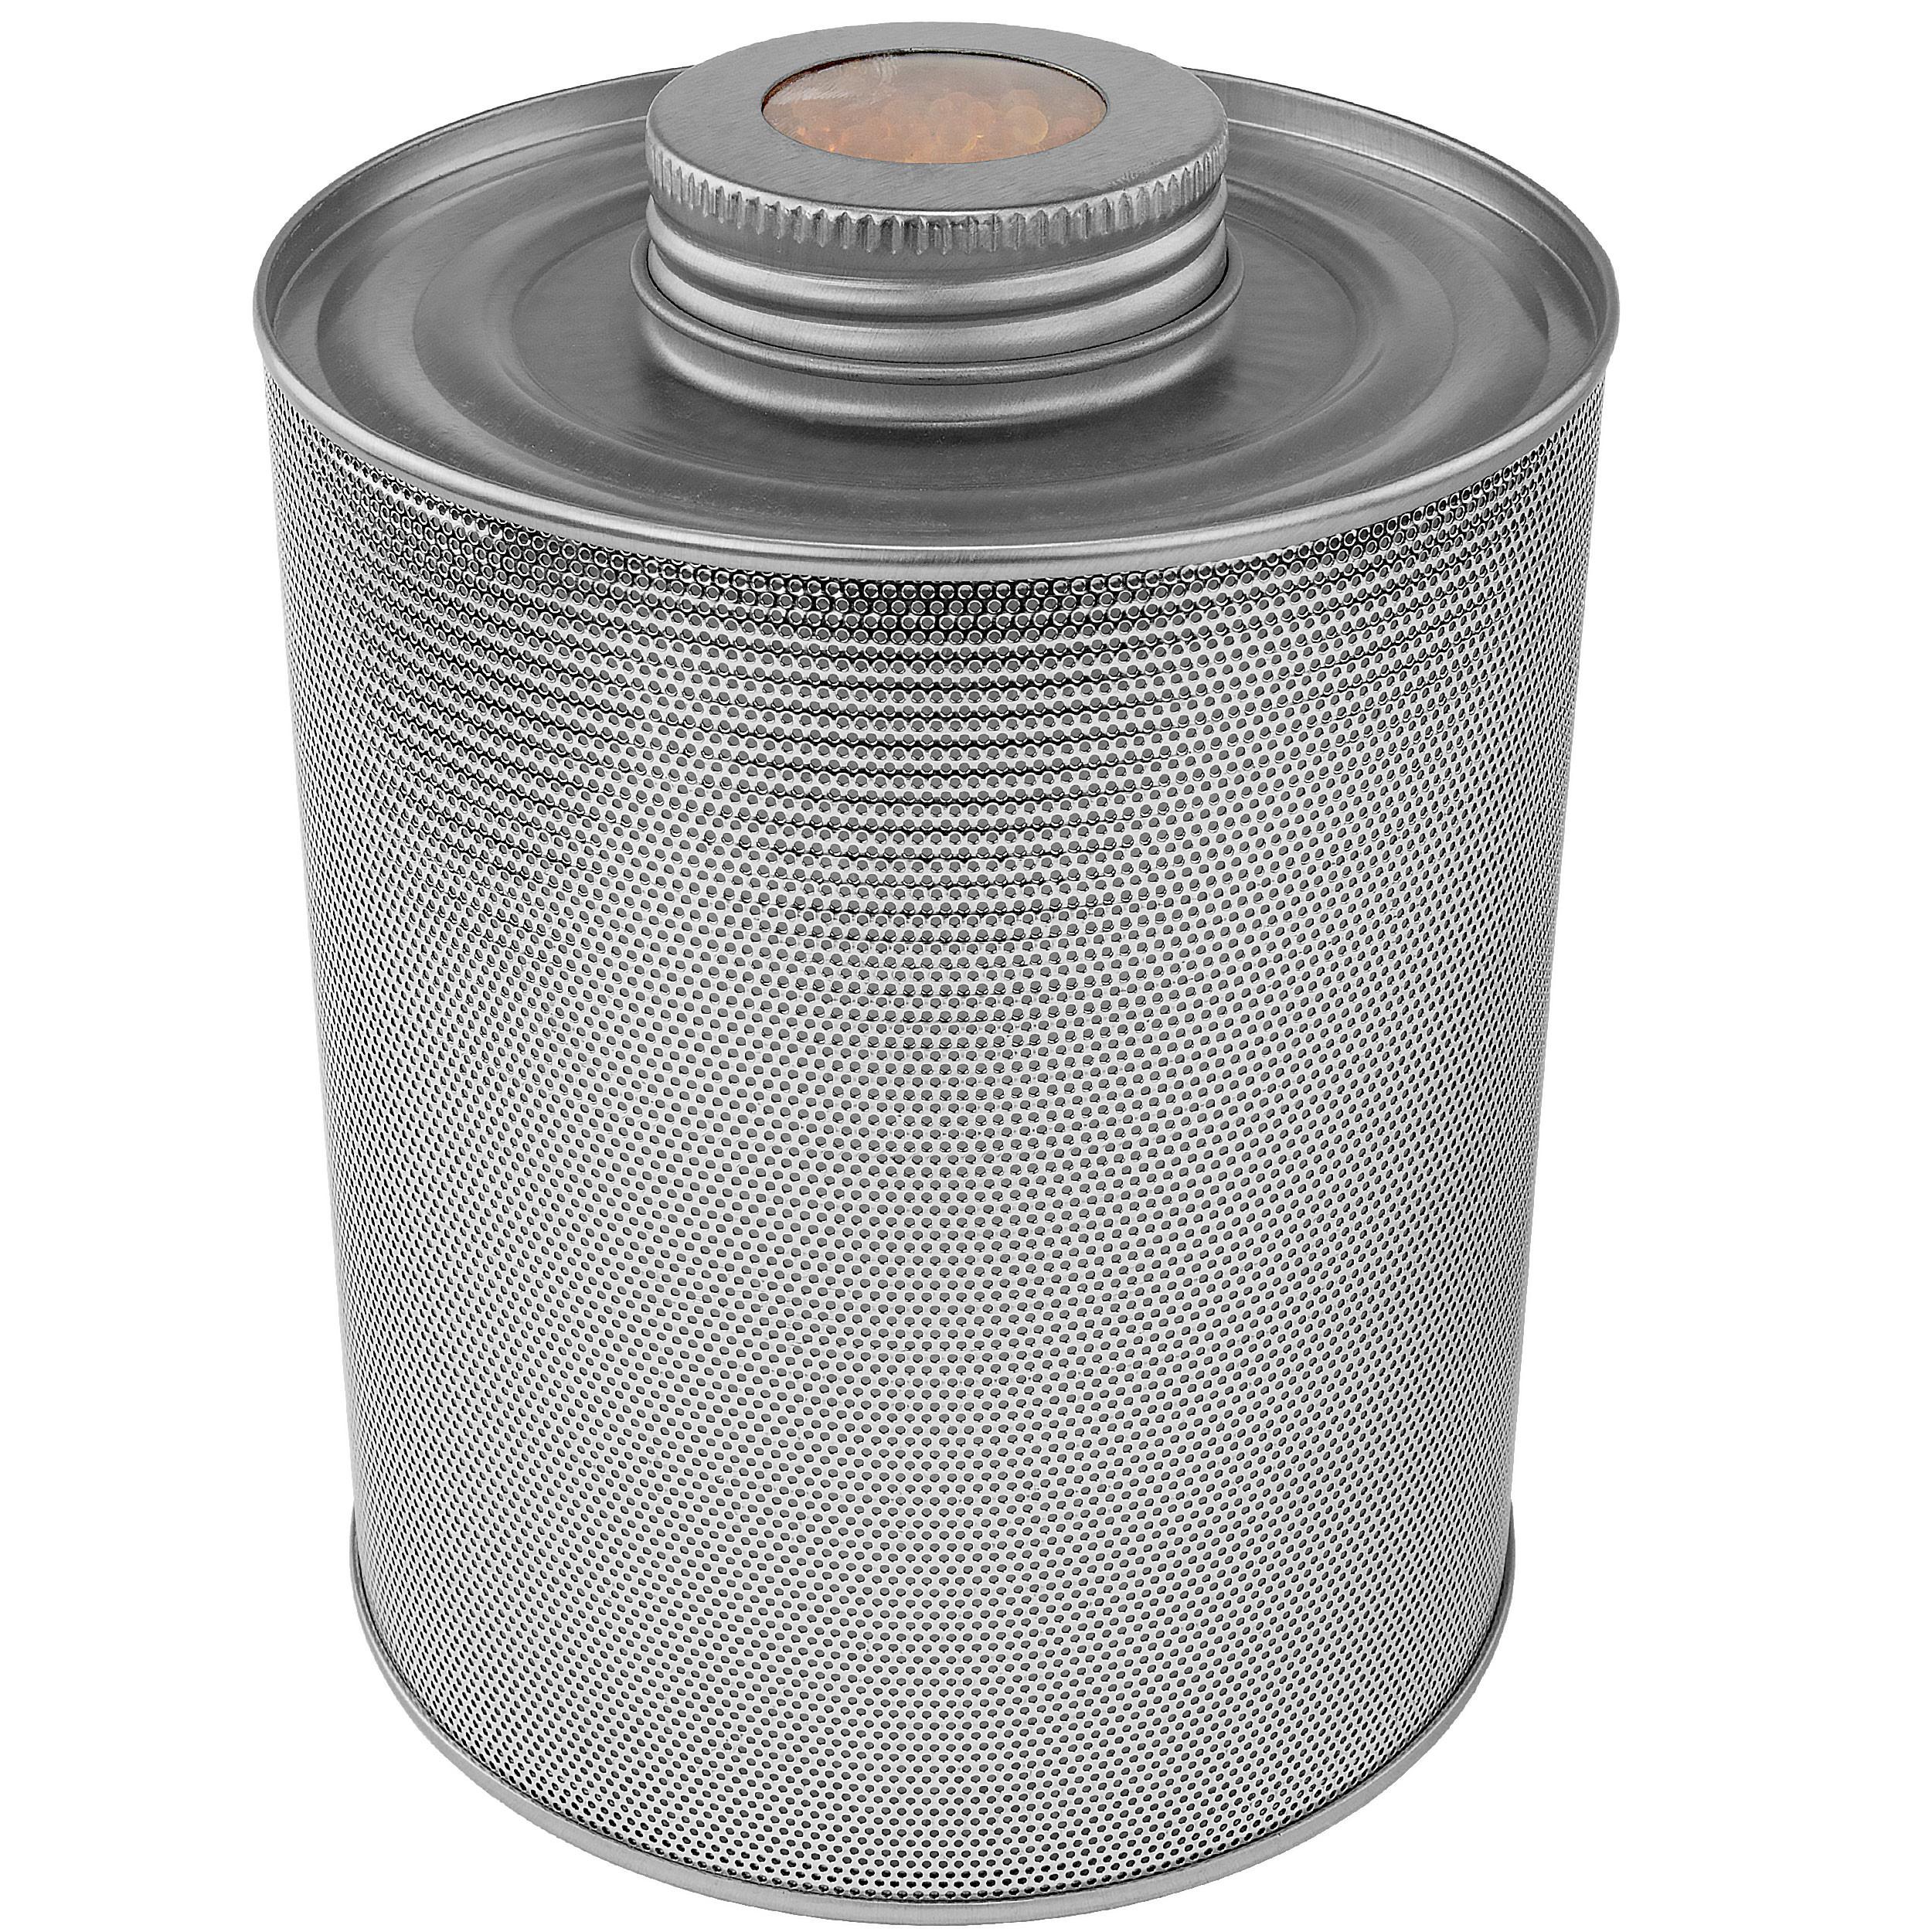 750 Gram Indicating Silica Gel Steel Canister